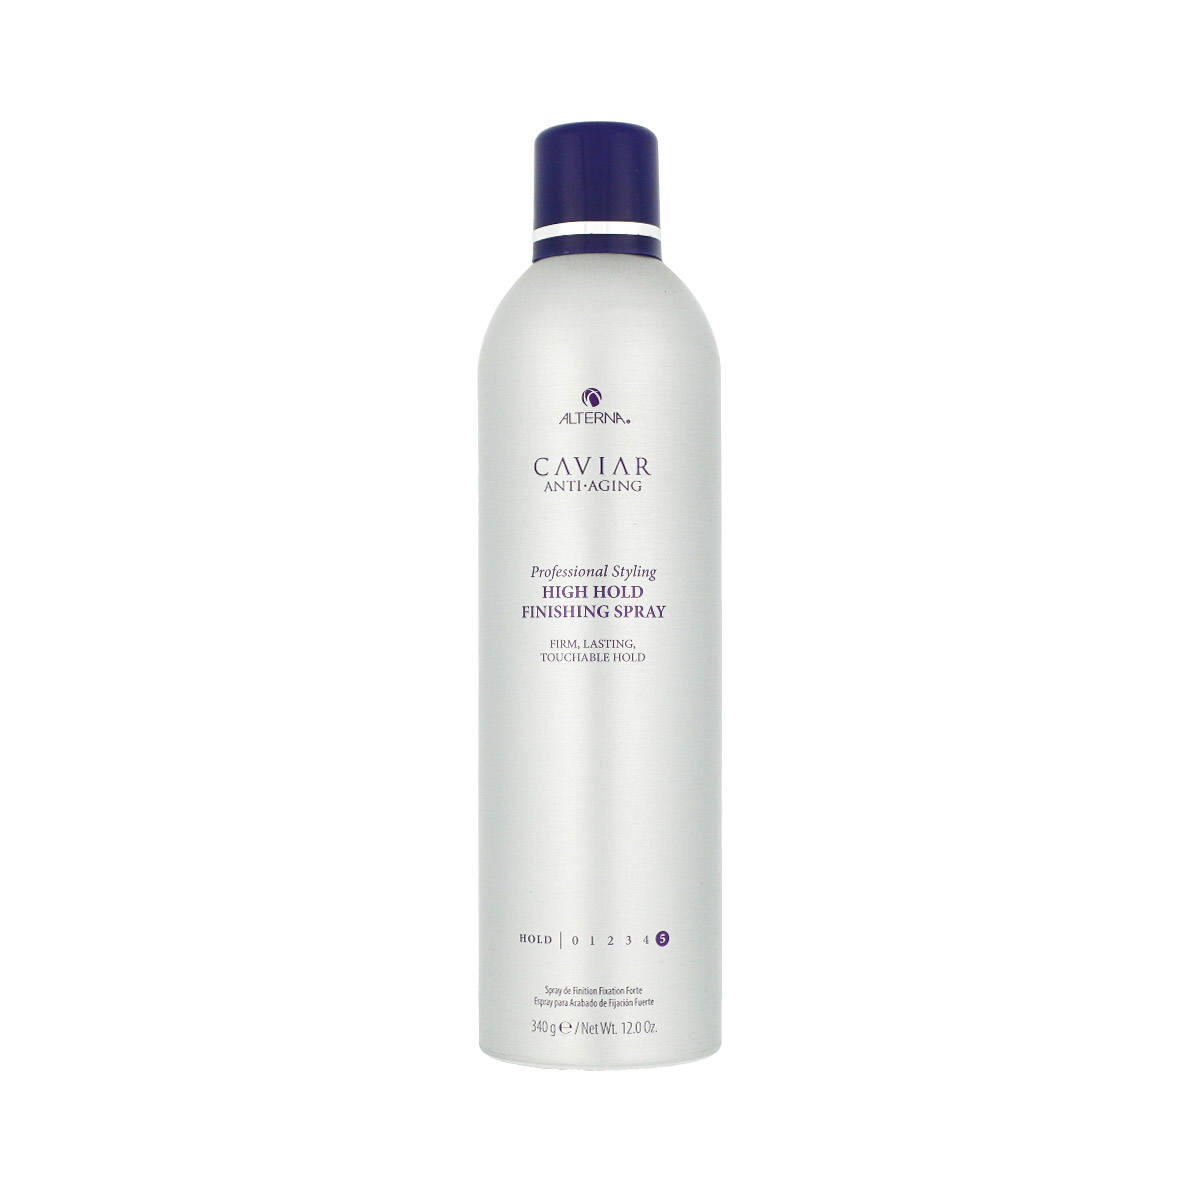 Alterna Caviar High Hold Finishing Spray 340 g 14732